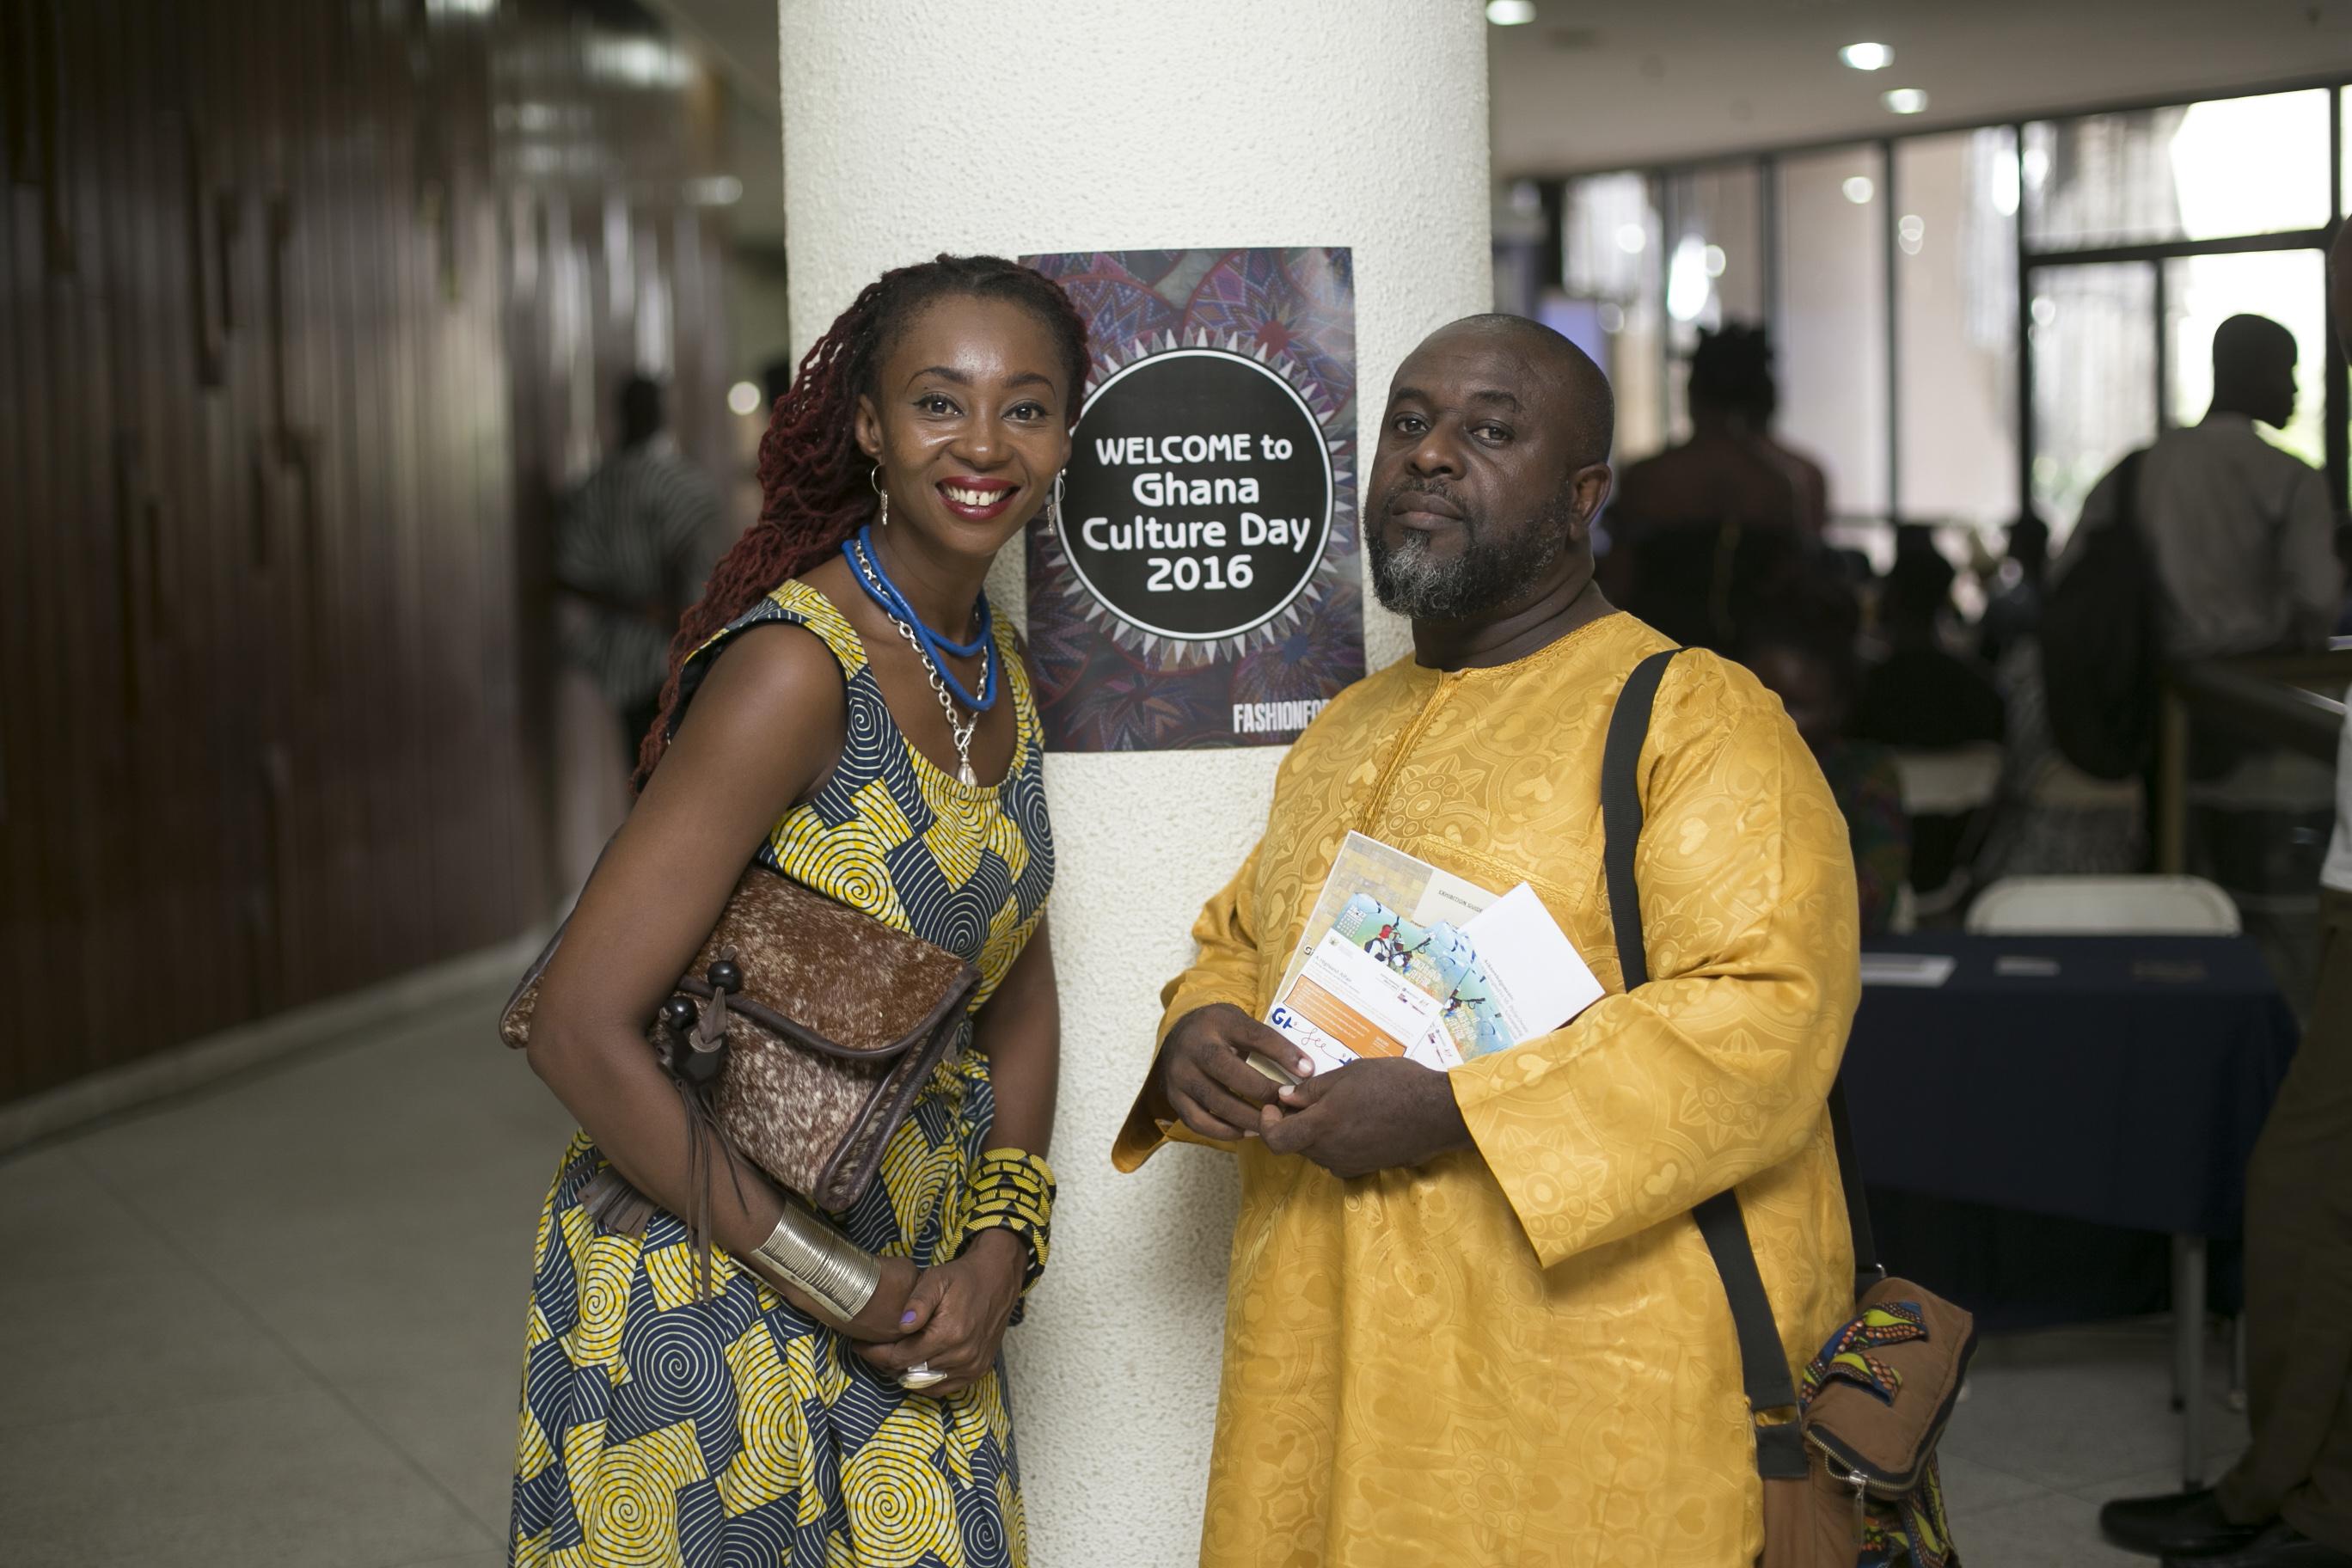 Founder Makeba Boateng and journalist PaJohn Benstifi Dadson